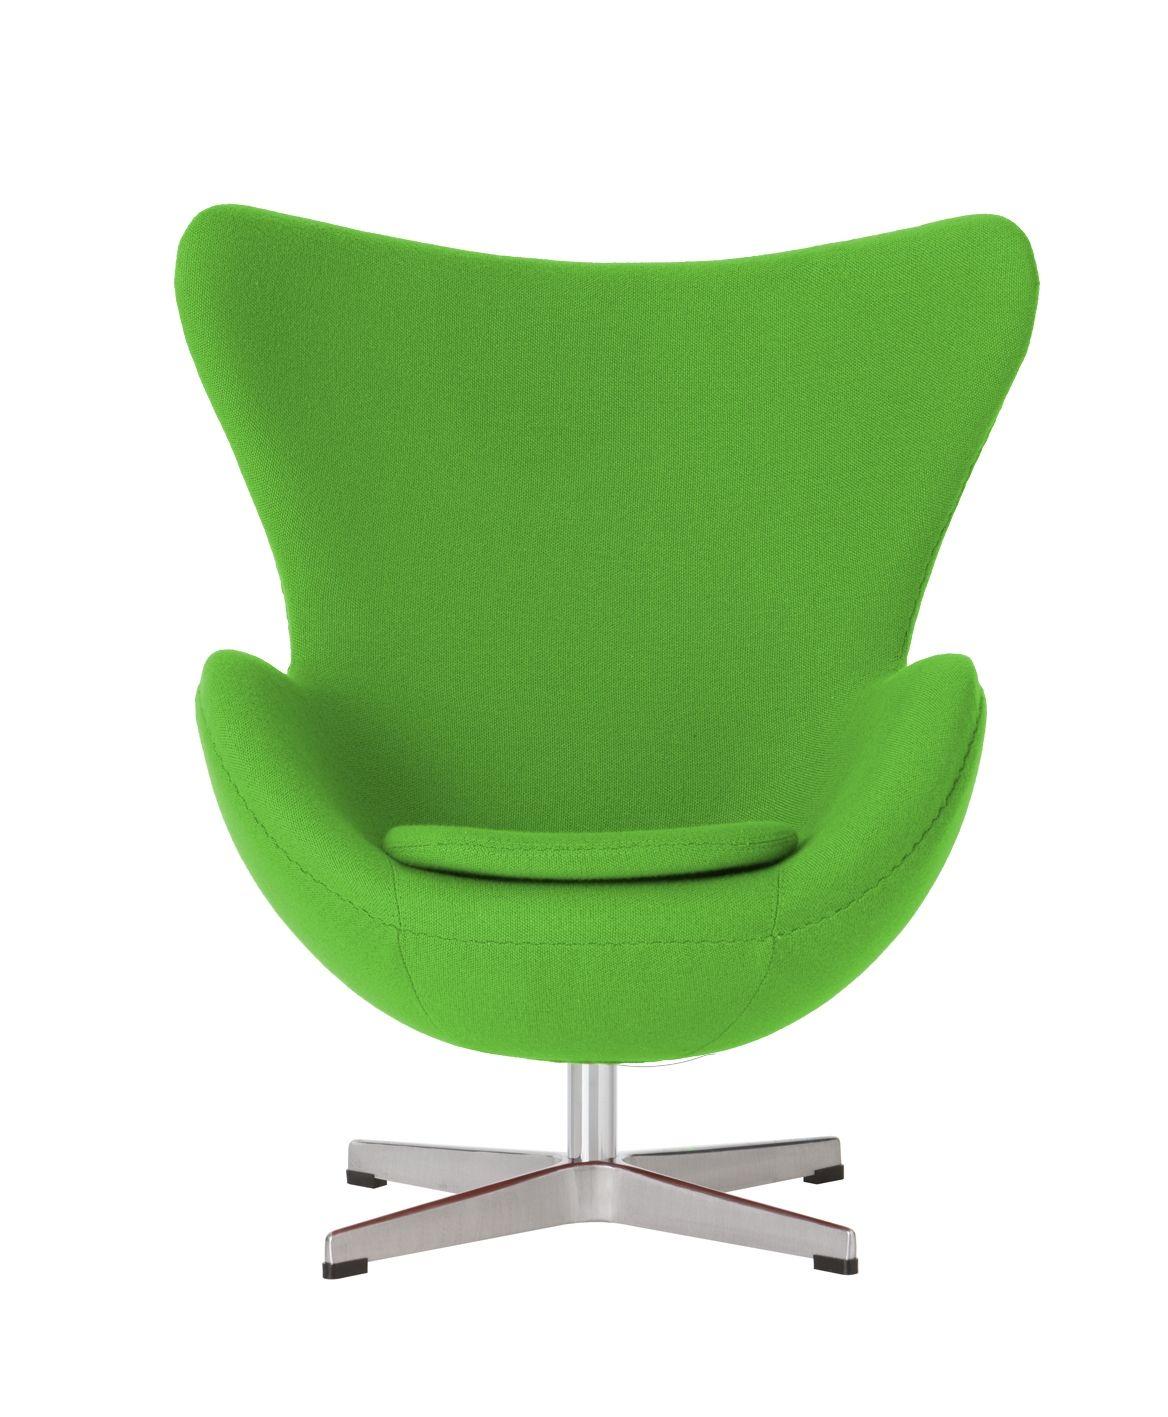 arne jacobsen egg chair replica. Miniature Egg Chair Replica By Little Nest. Arne Jacobsen